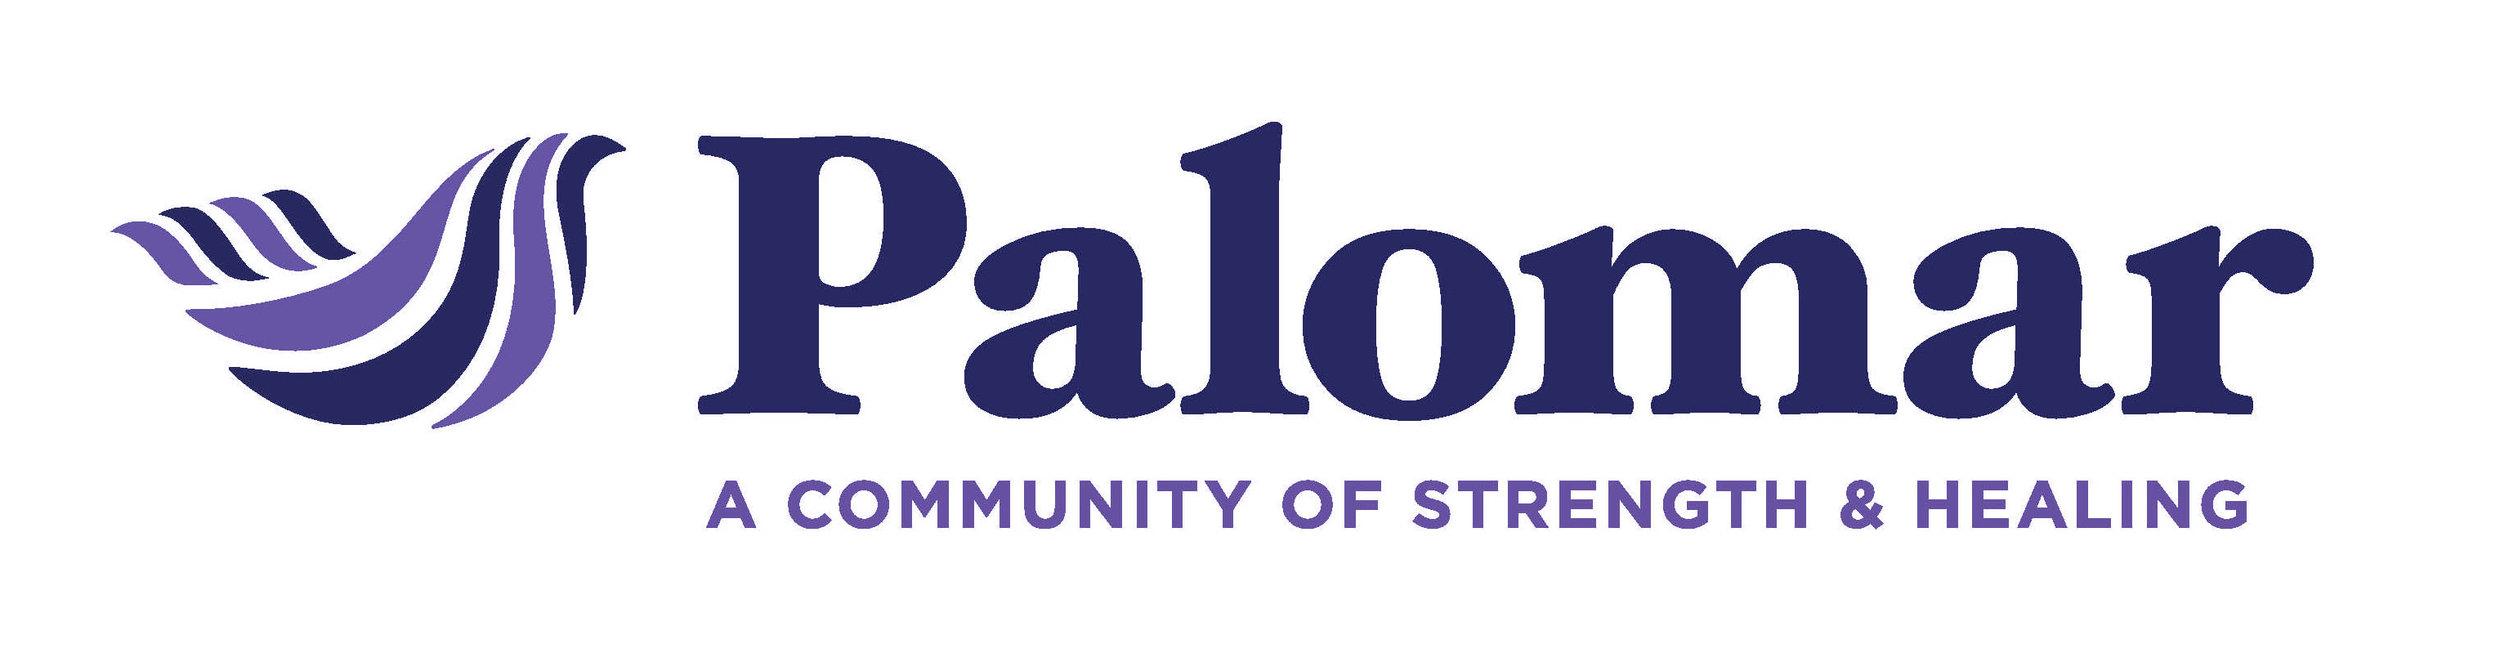 Visit Palomar's website.